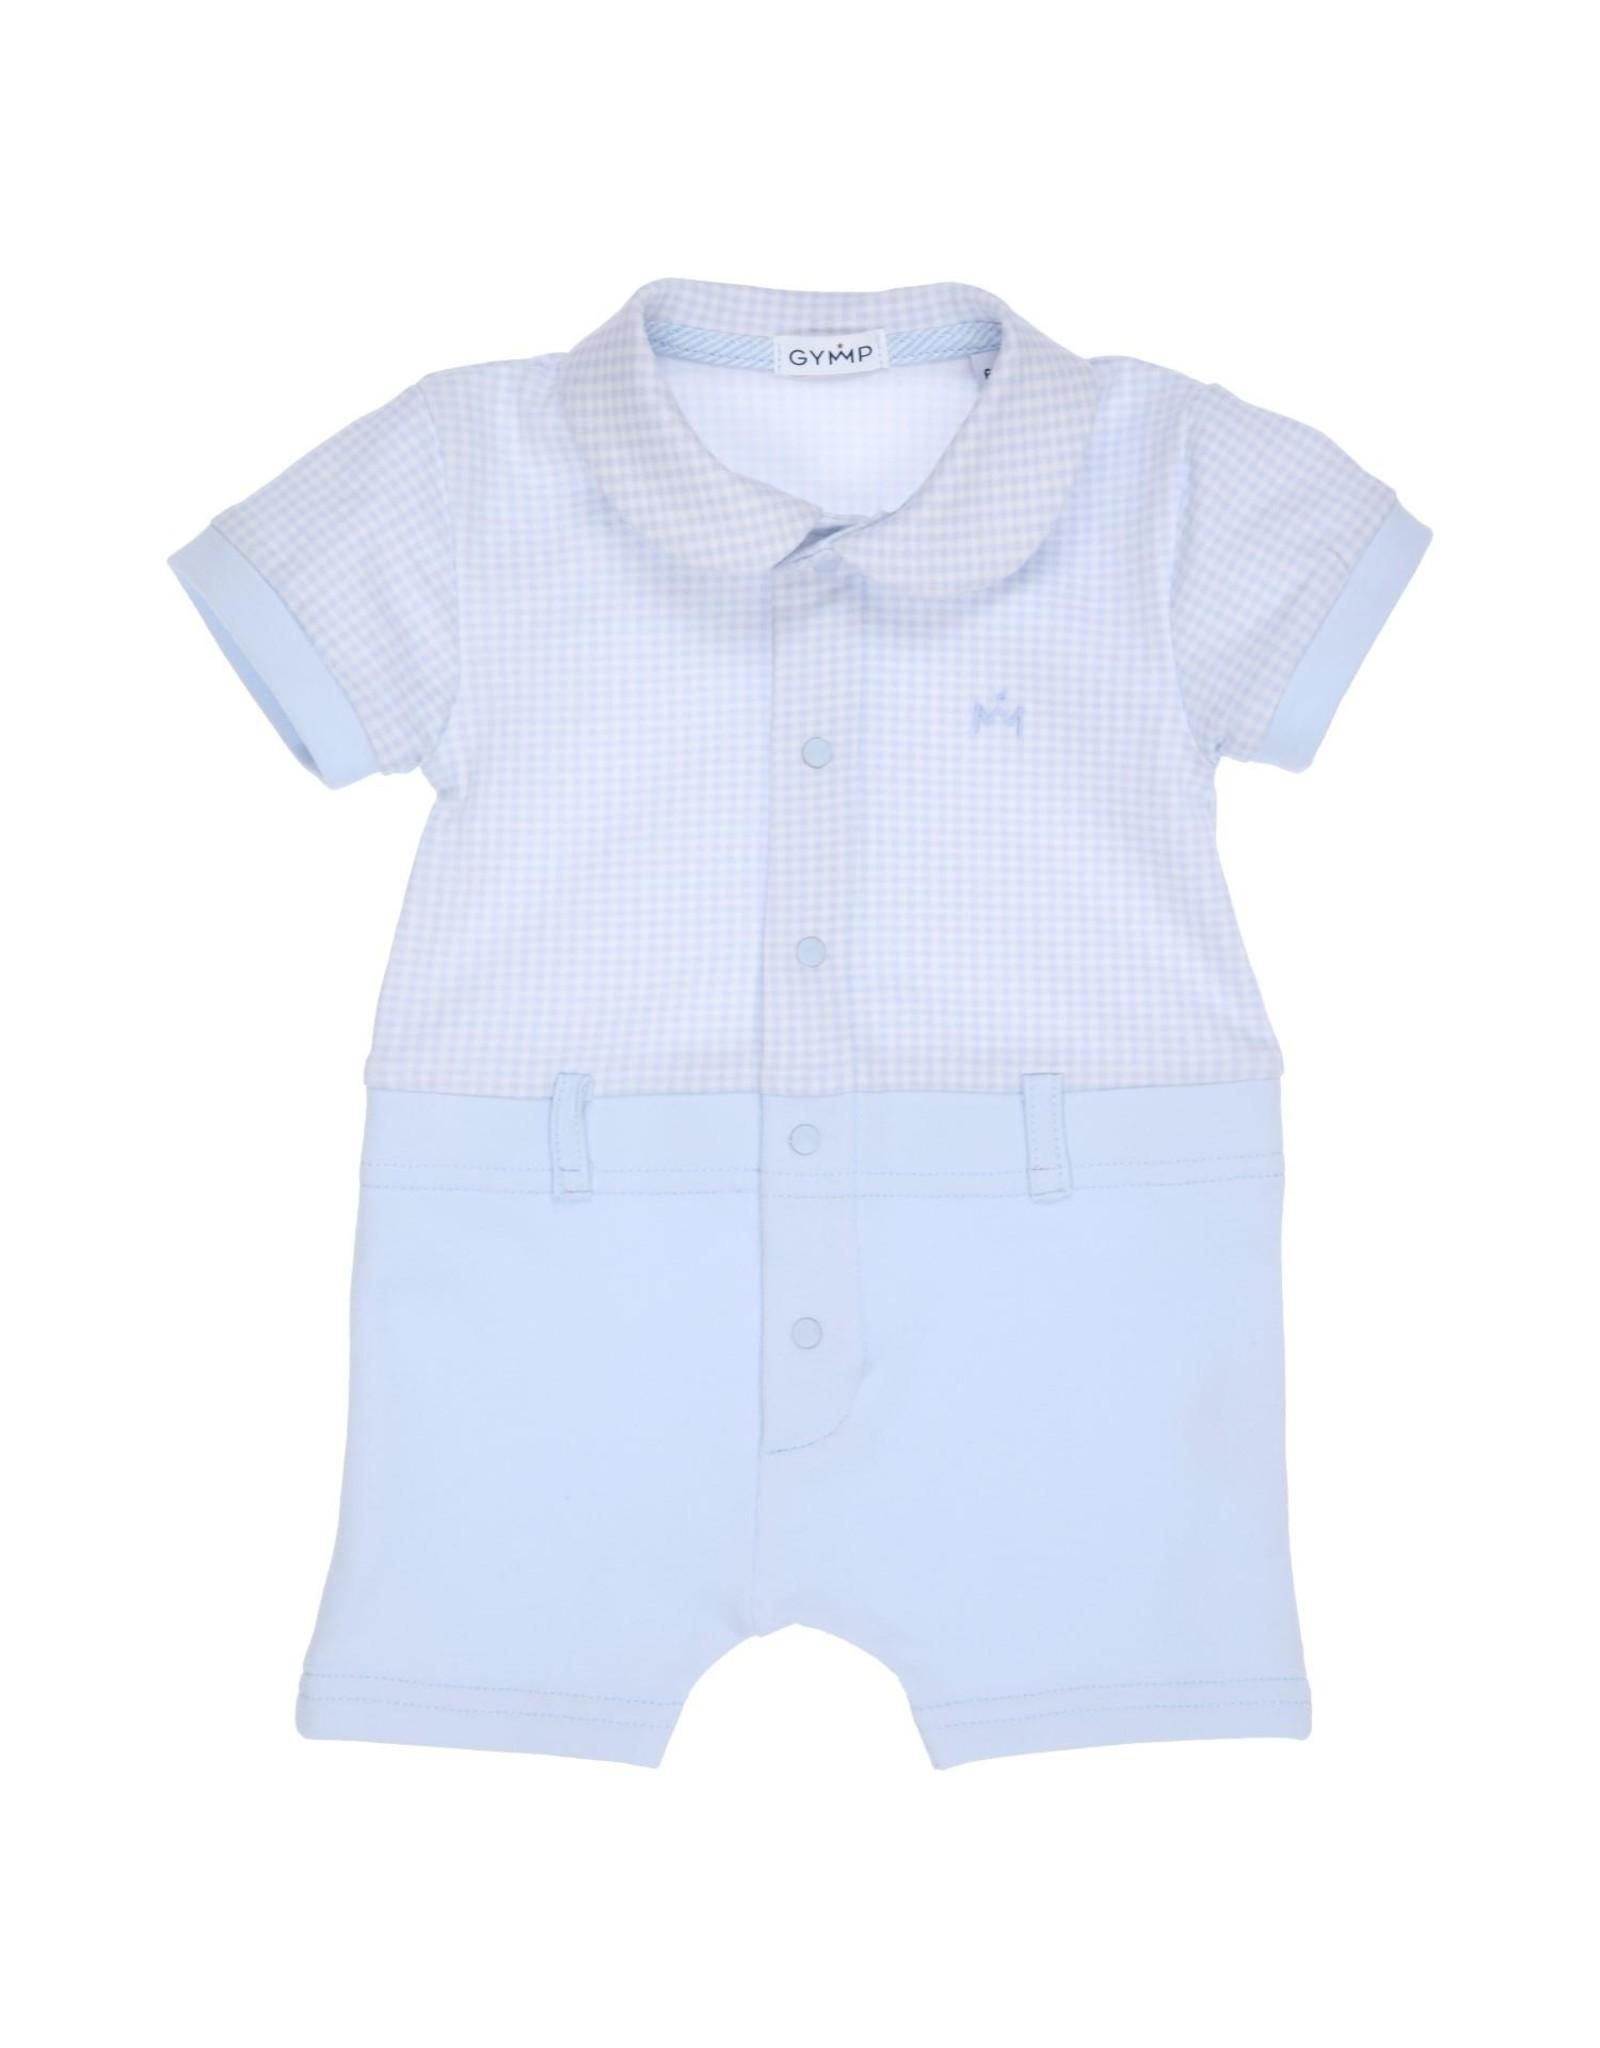 Gymp babypakje - playsuit - vidrio  lichtblauw